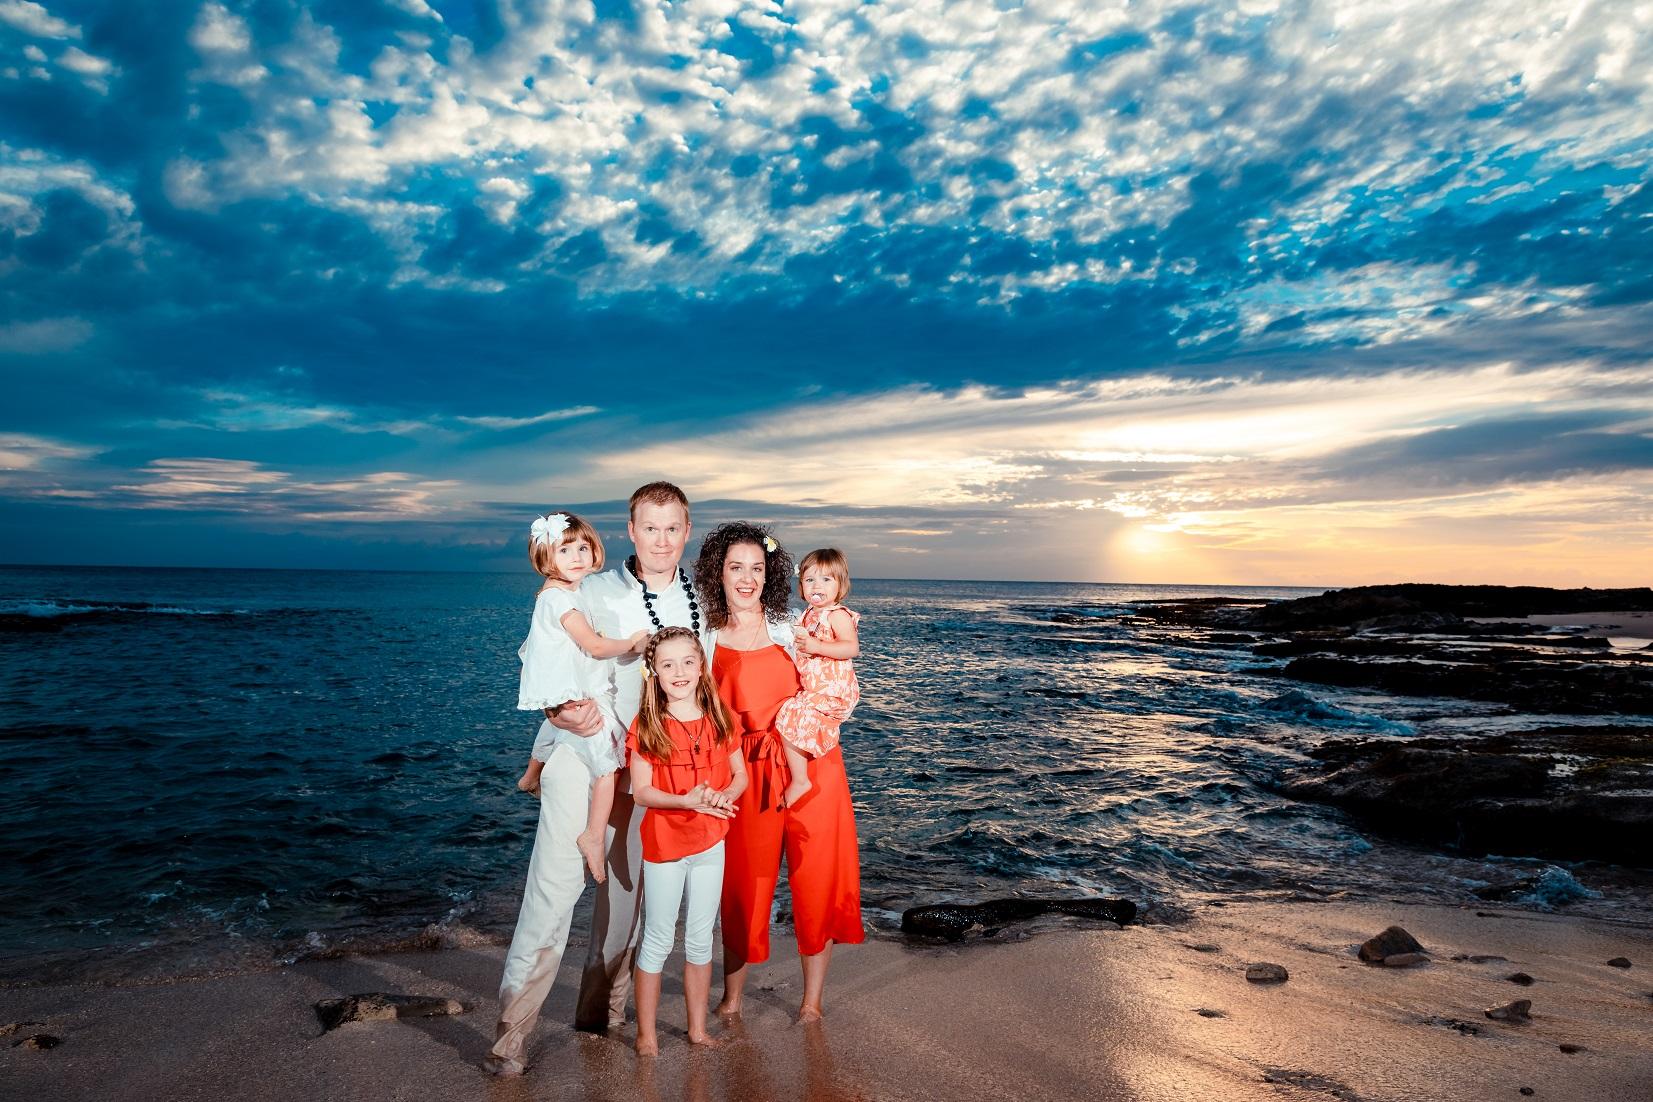 family vacation beach photos at sunset disney aulani resort oahu